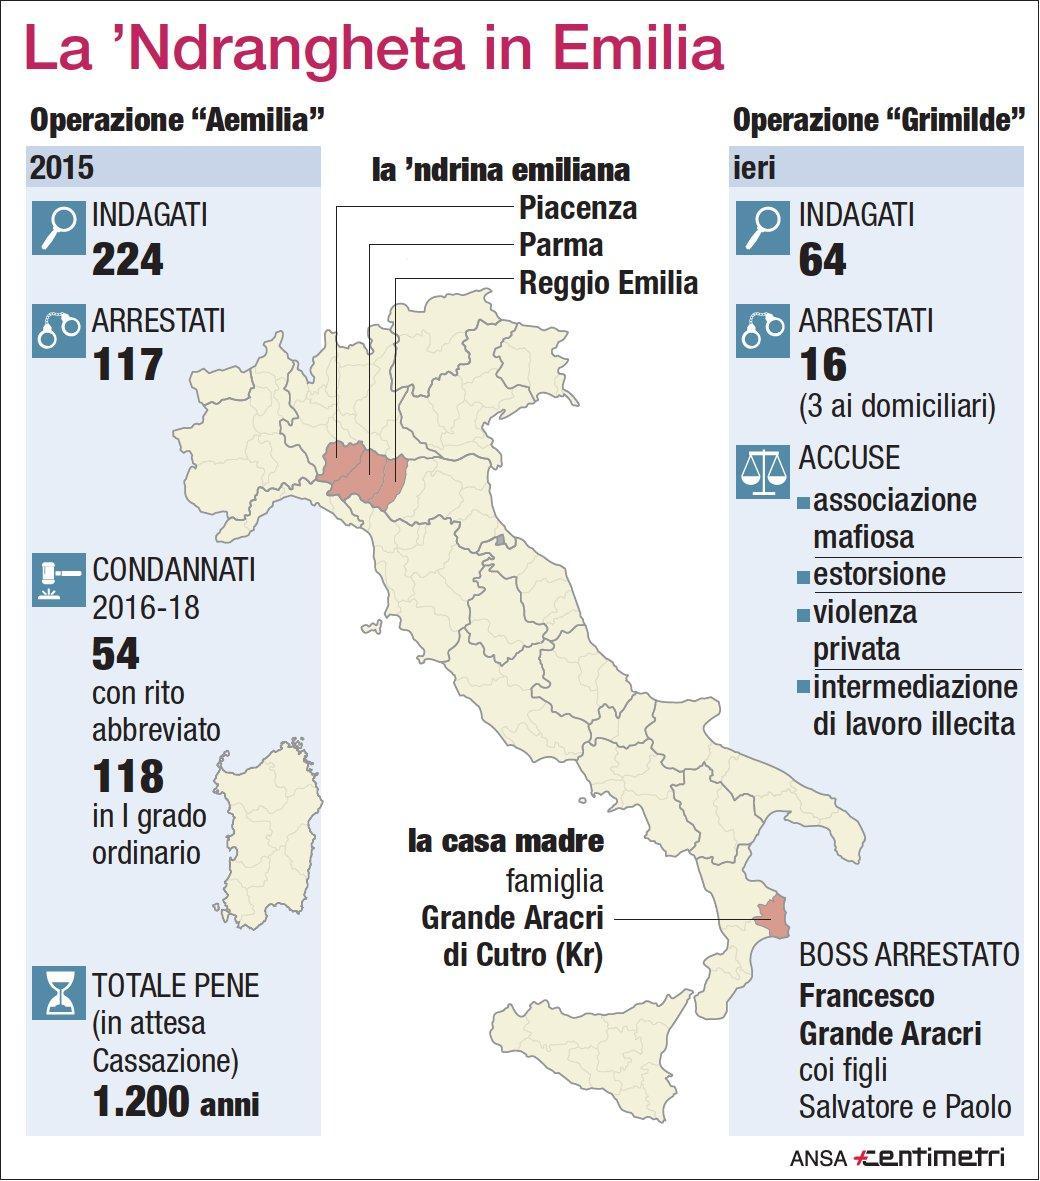 Blitz contro la 'ndrangheta in Emilia Romagna